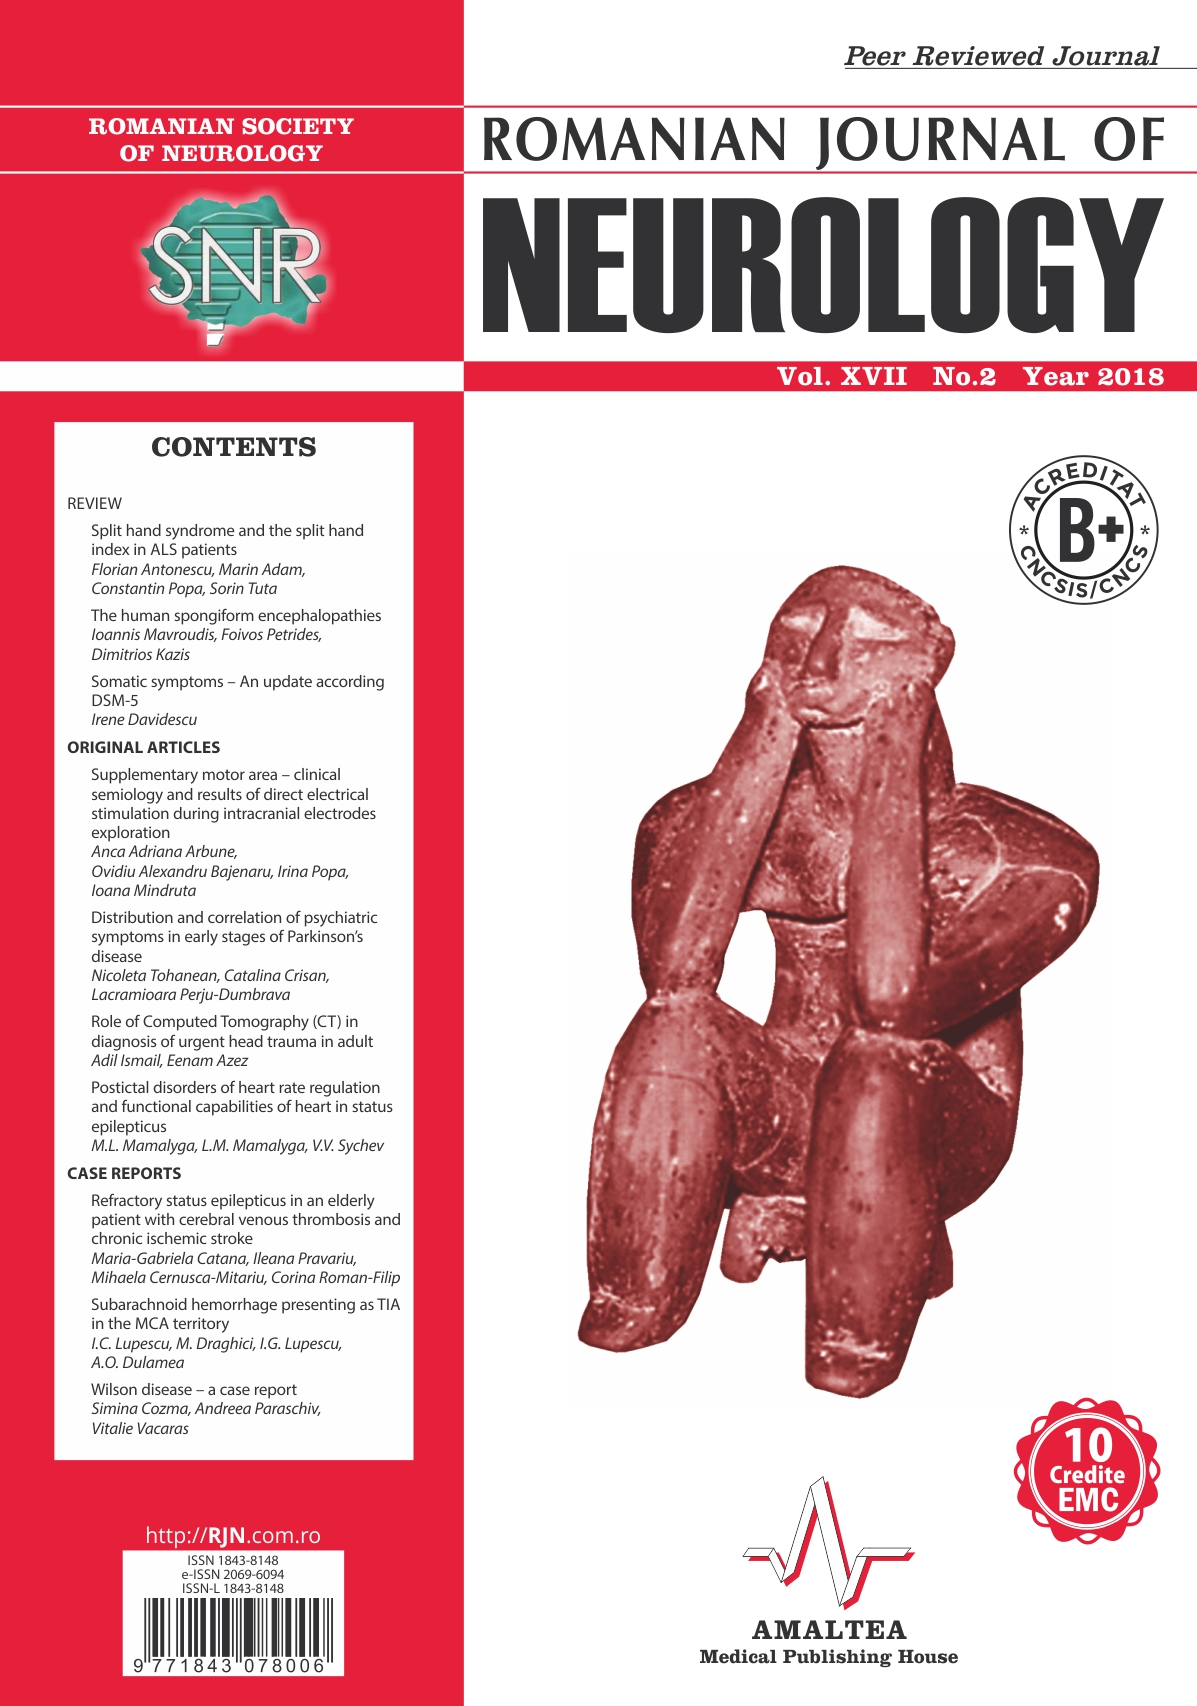 Romanian Journal of Neurology, Volume XVII, No. 2, 2018